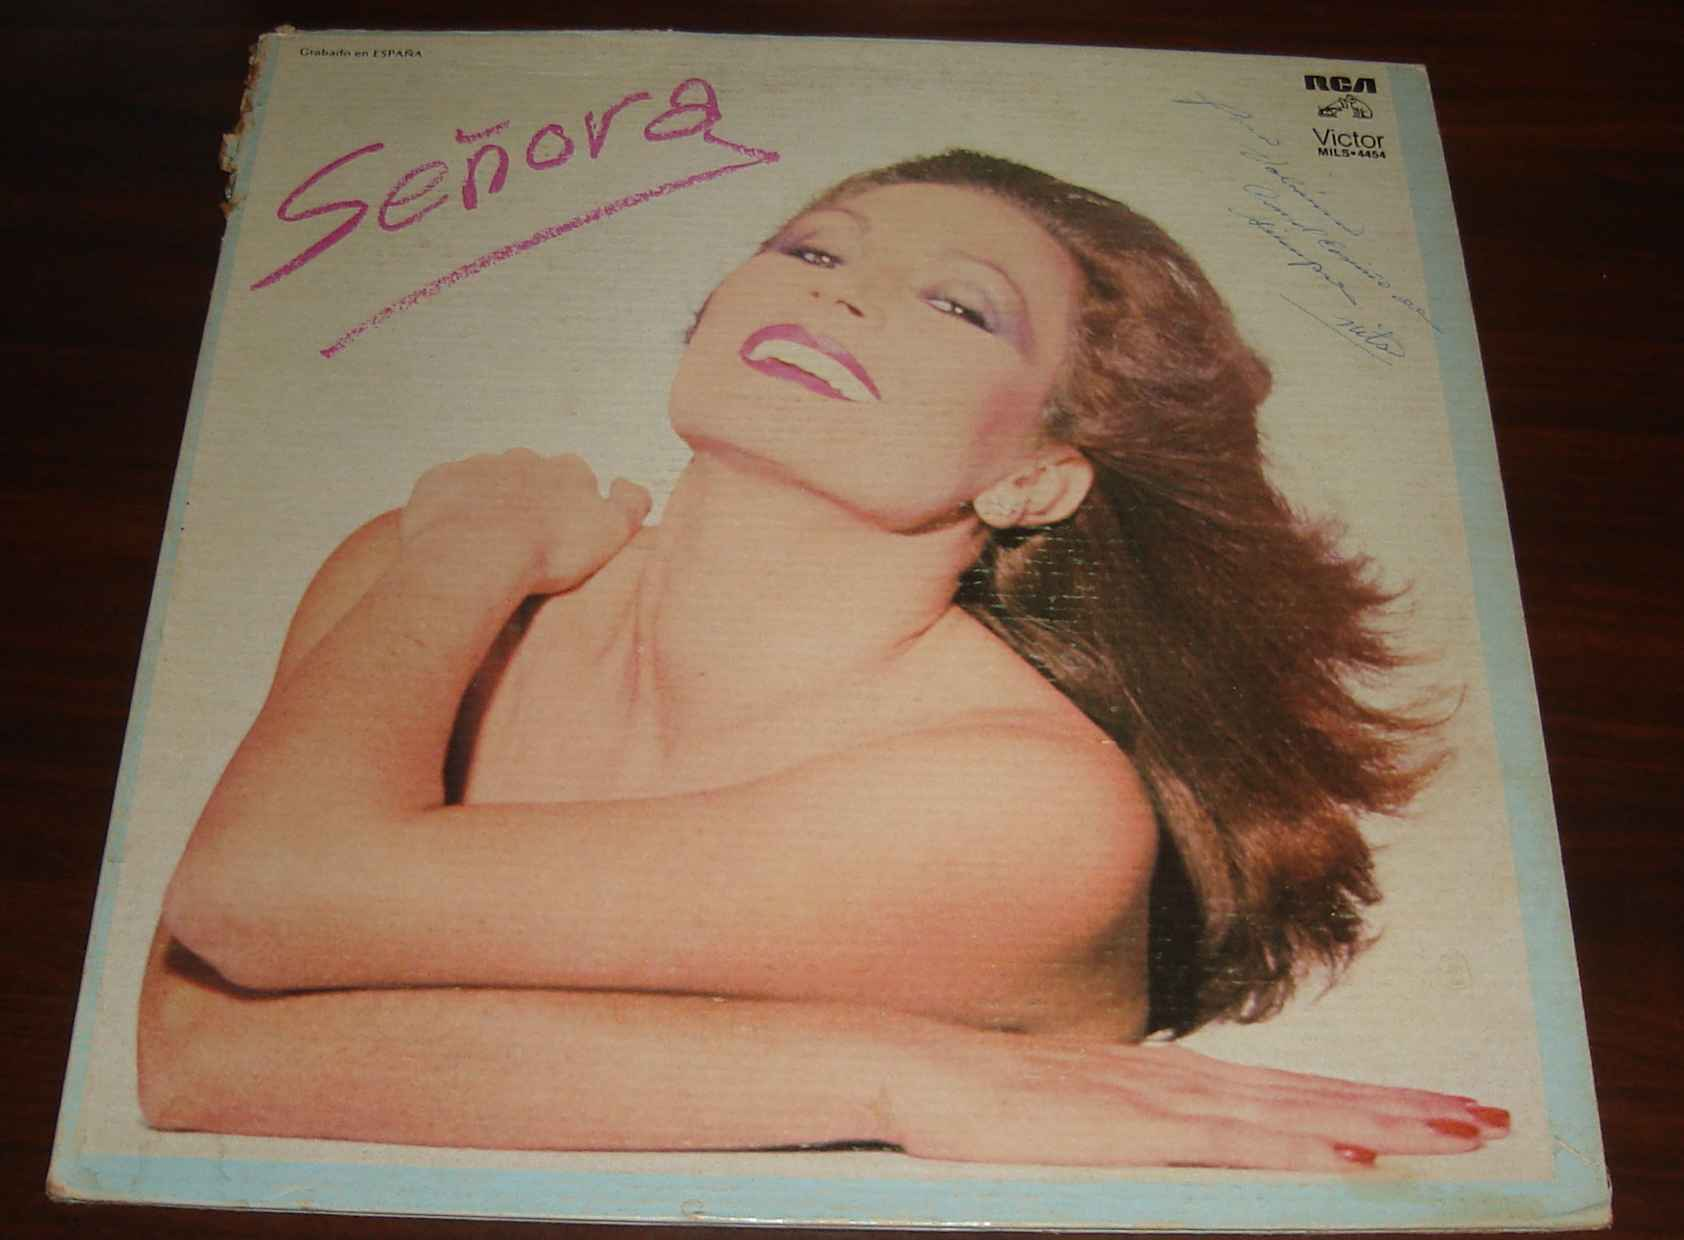 Rocio Jurado's Senora